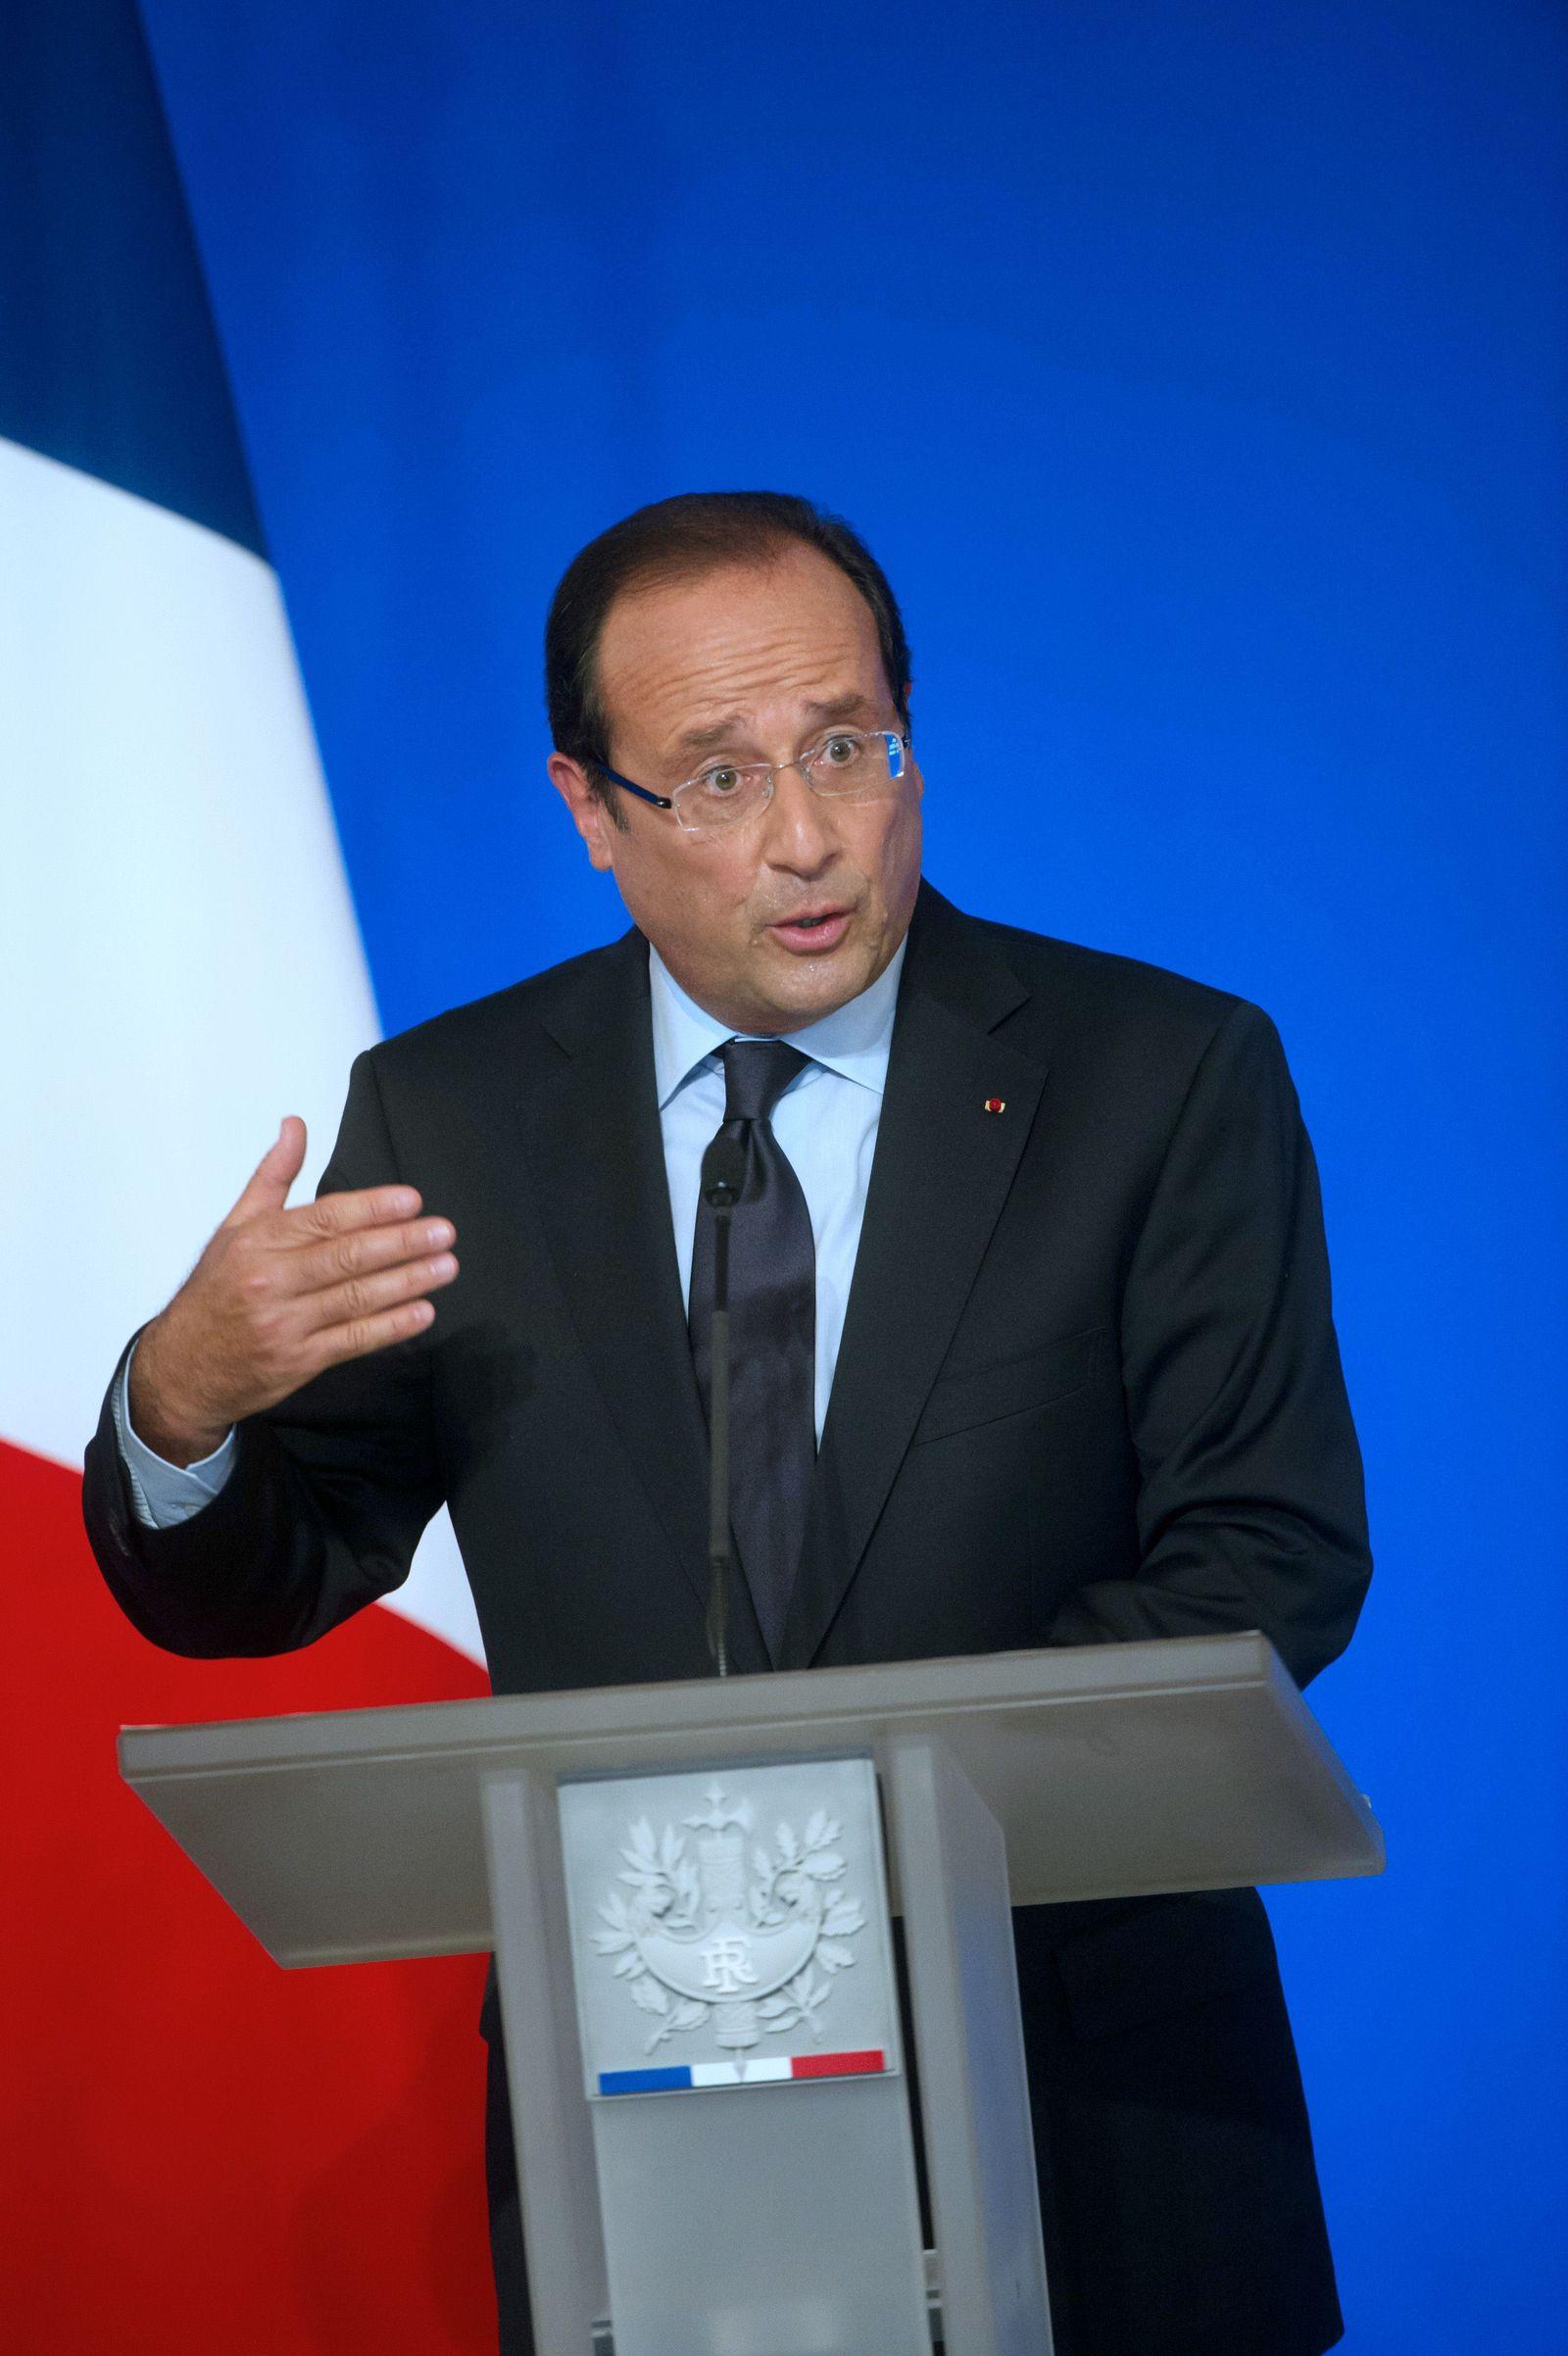 Frankreich Hollande